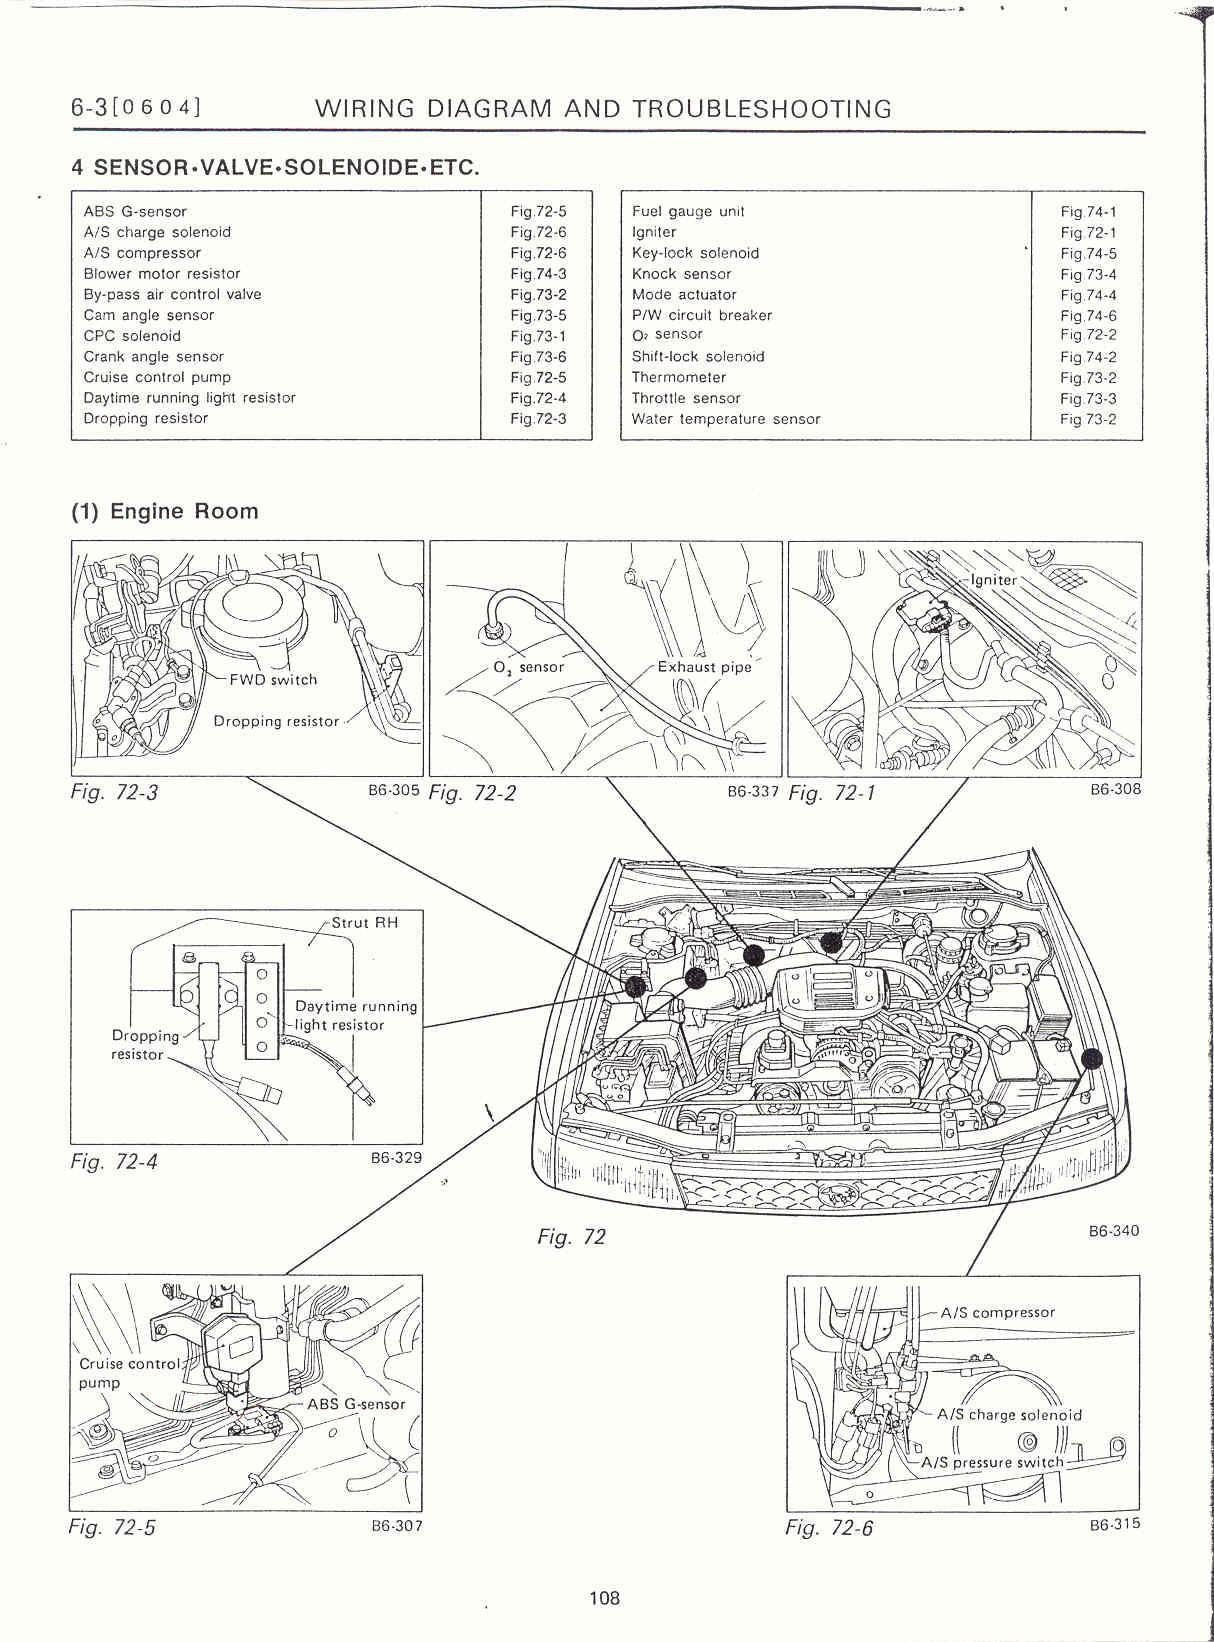 hight resolution of 2002 subaru impreza parts diagram u2022 wiring diagram for free 2001 subaru outback engine diagram subaru h6 engine diagram